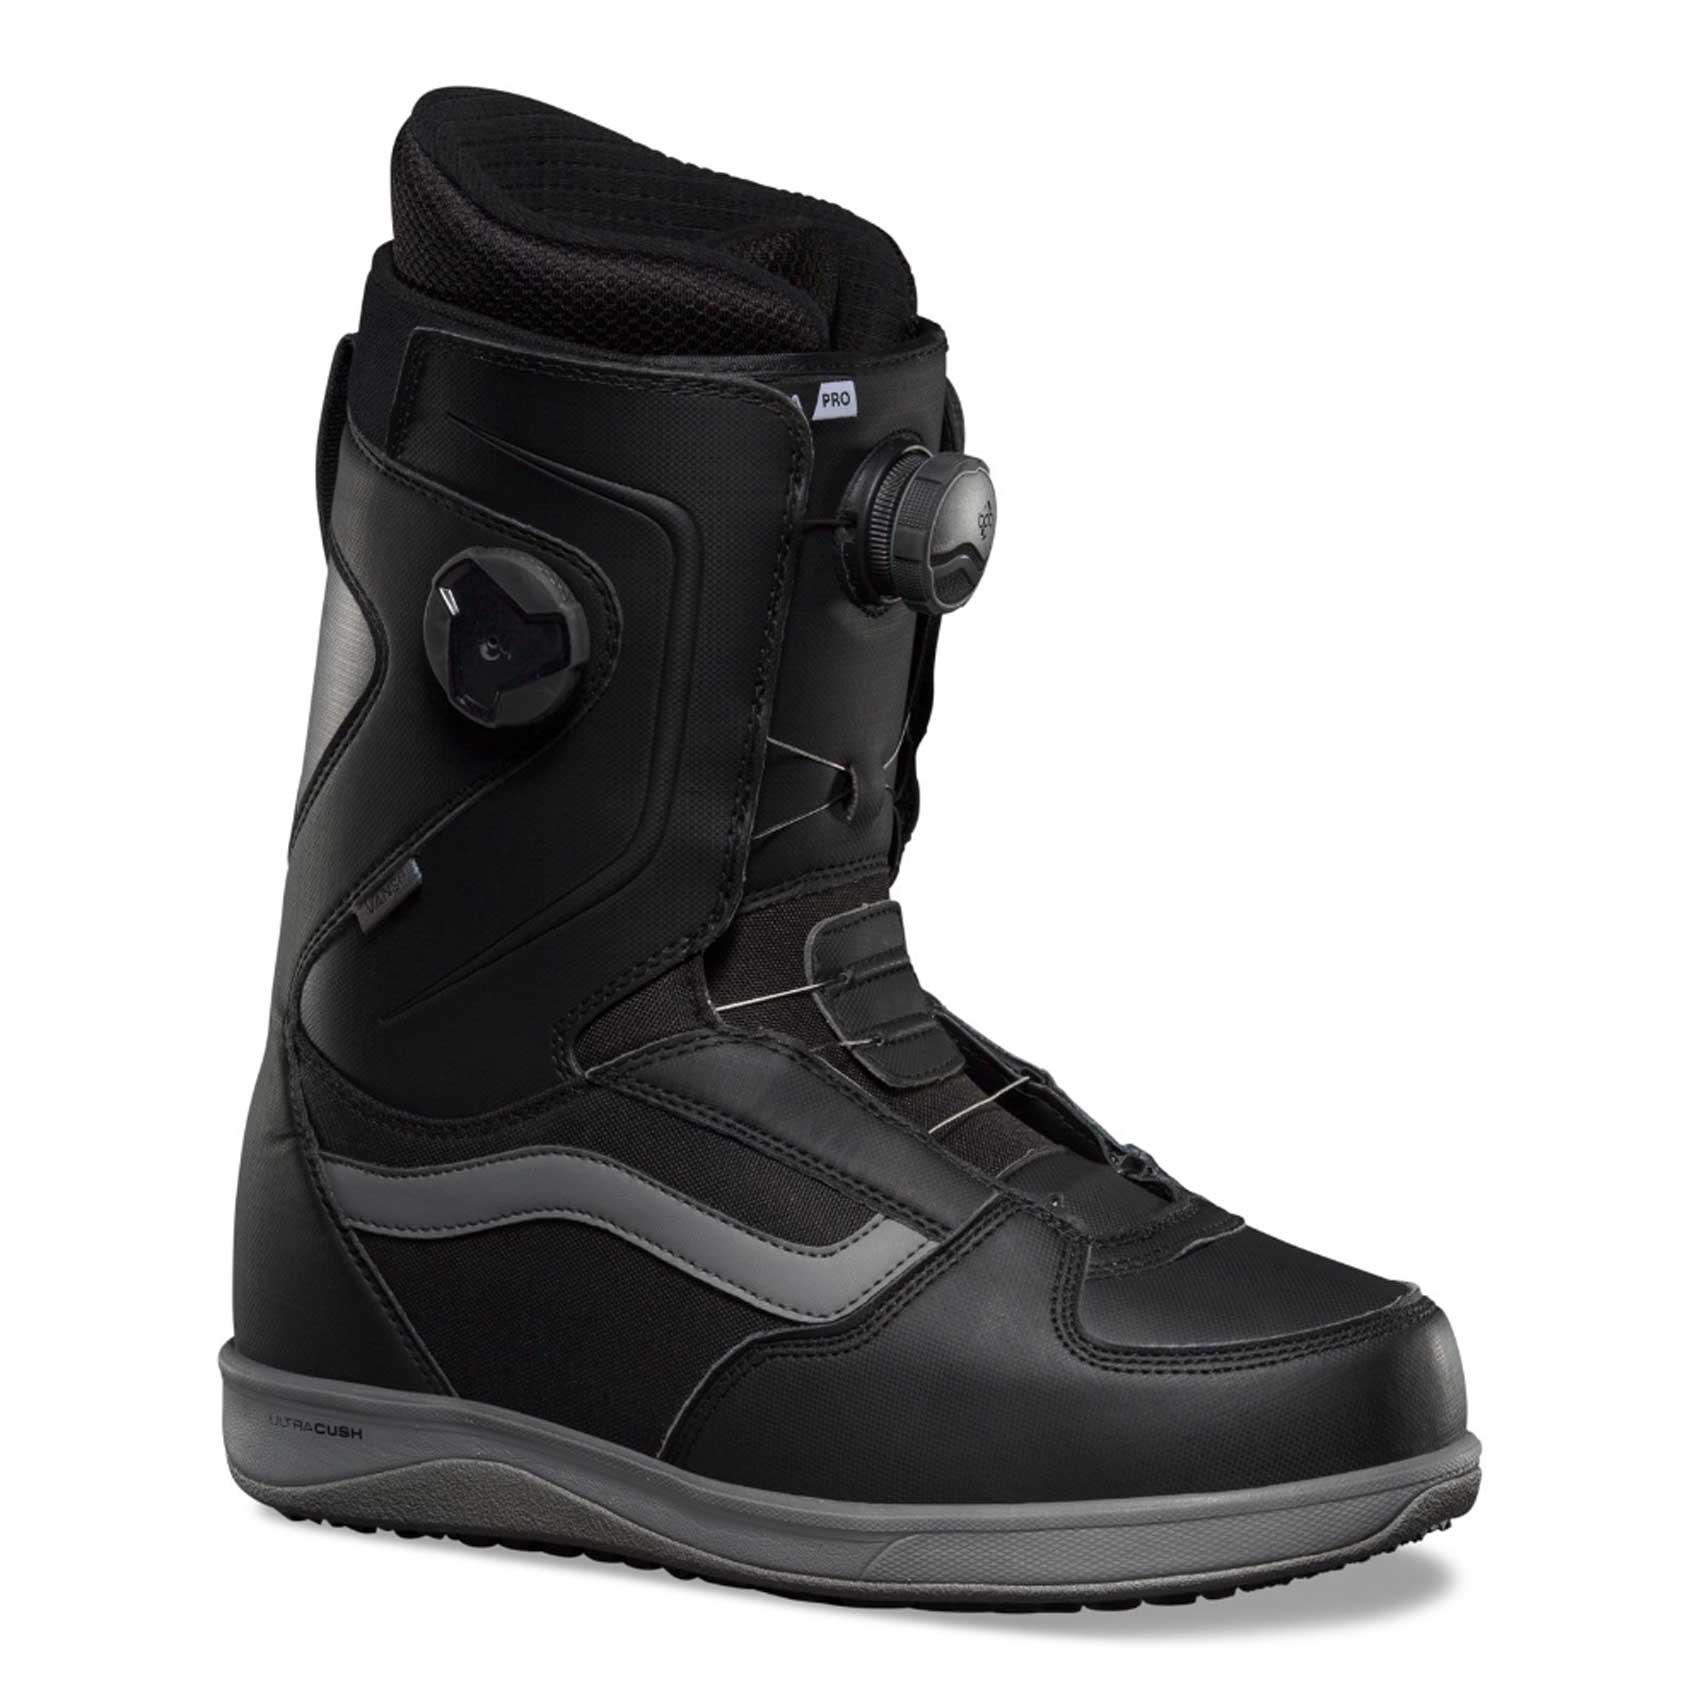 copy of Boots Snow Vans Aura Pro Black